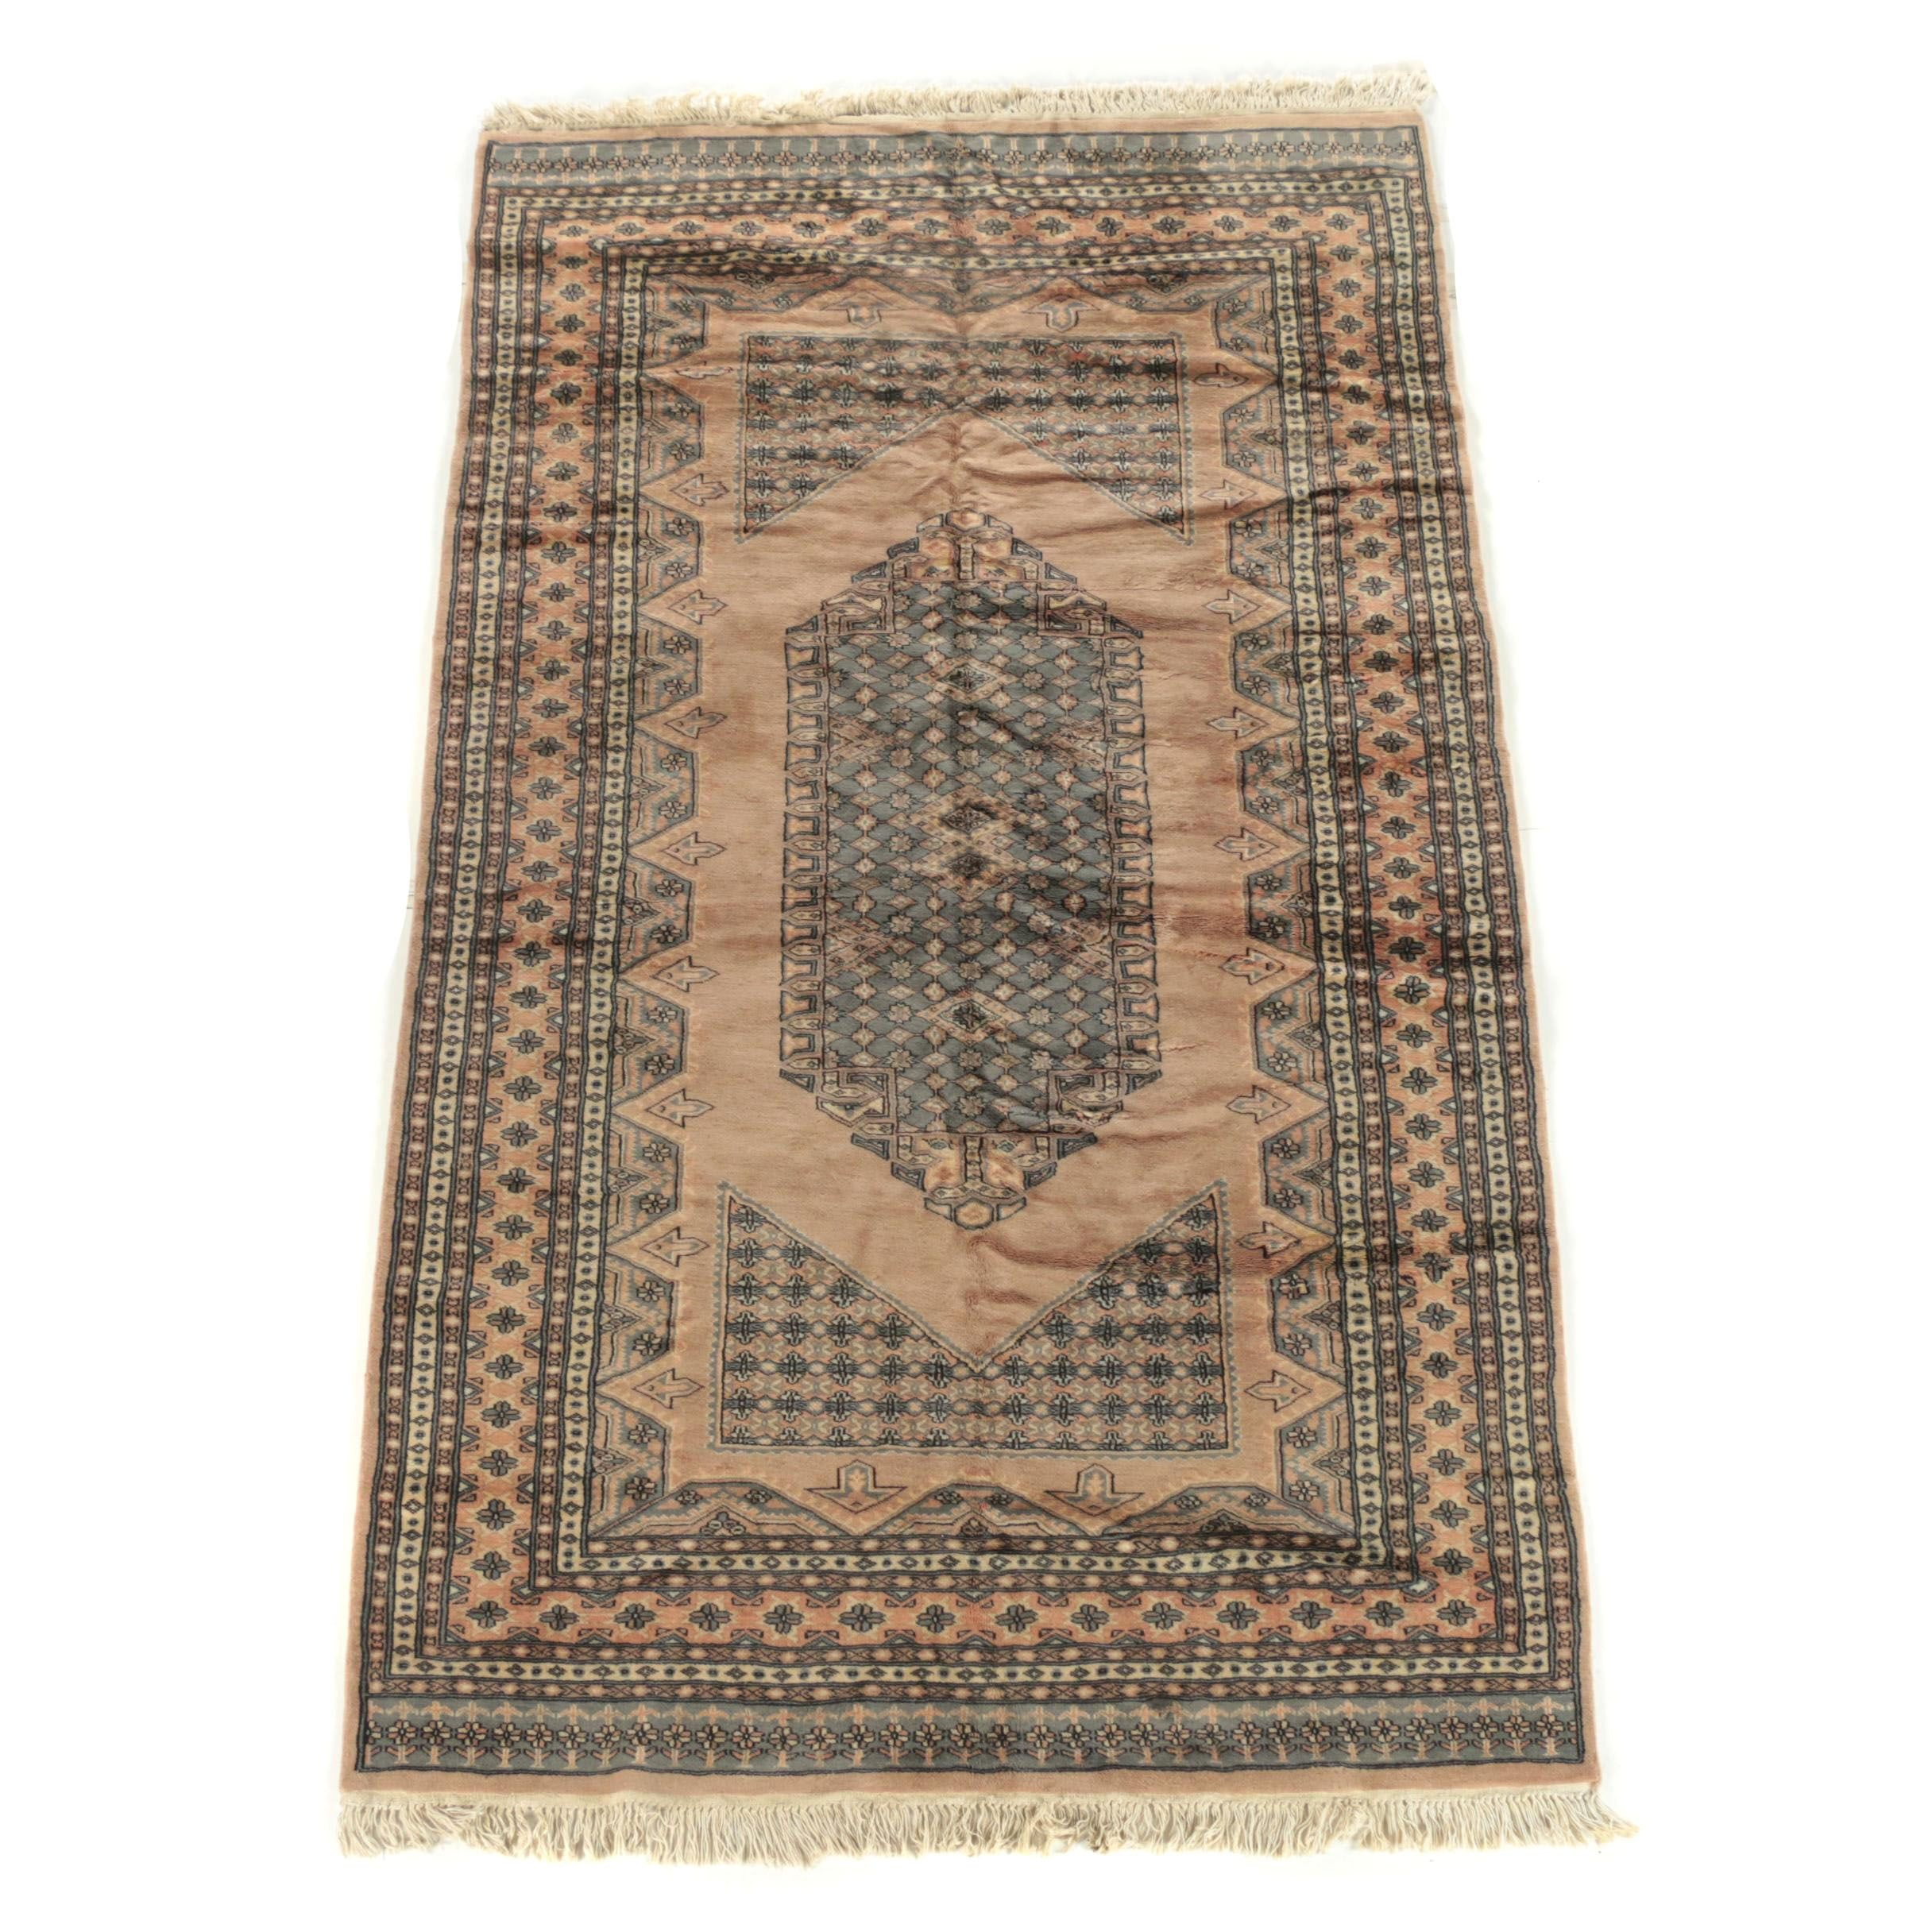 Hand-Knotted Pakistani Wool Area Rug